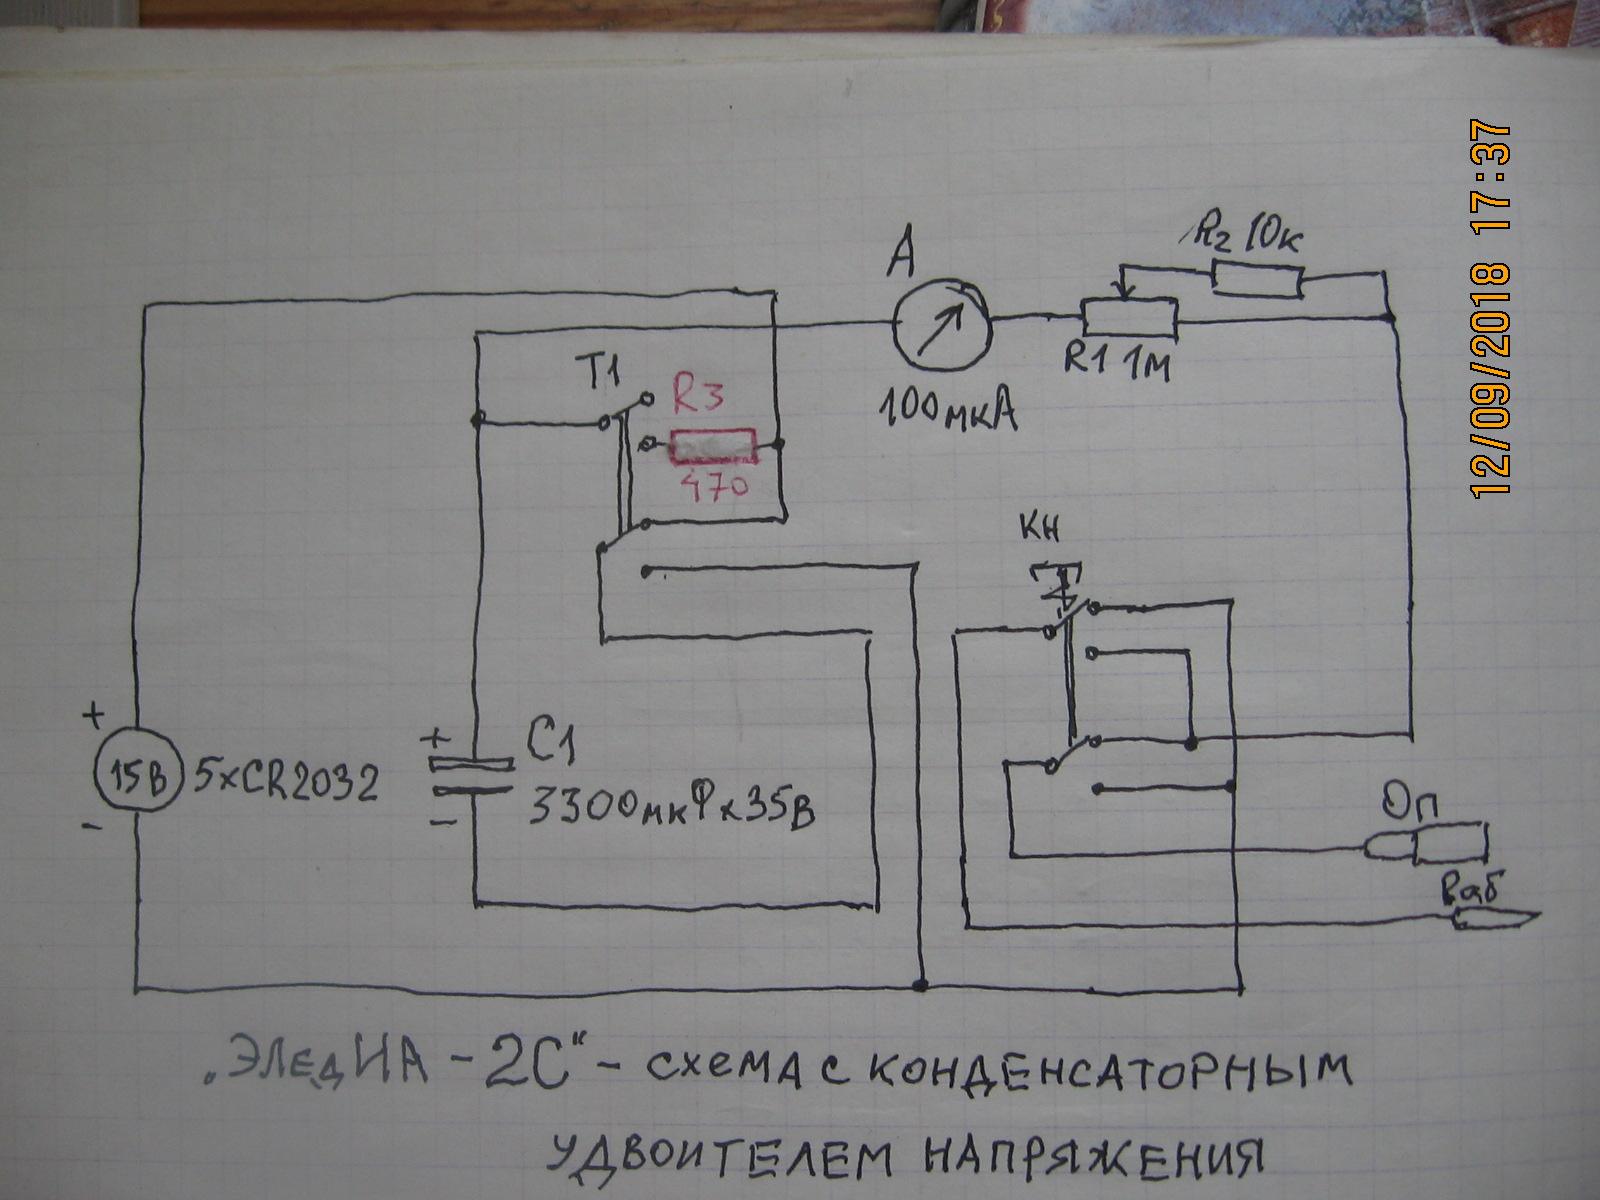 https://i5.imageban.ru/out/2018/09/15/6fe19d295f0fe4f035fc8d528caa5517.jpg